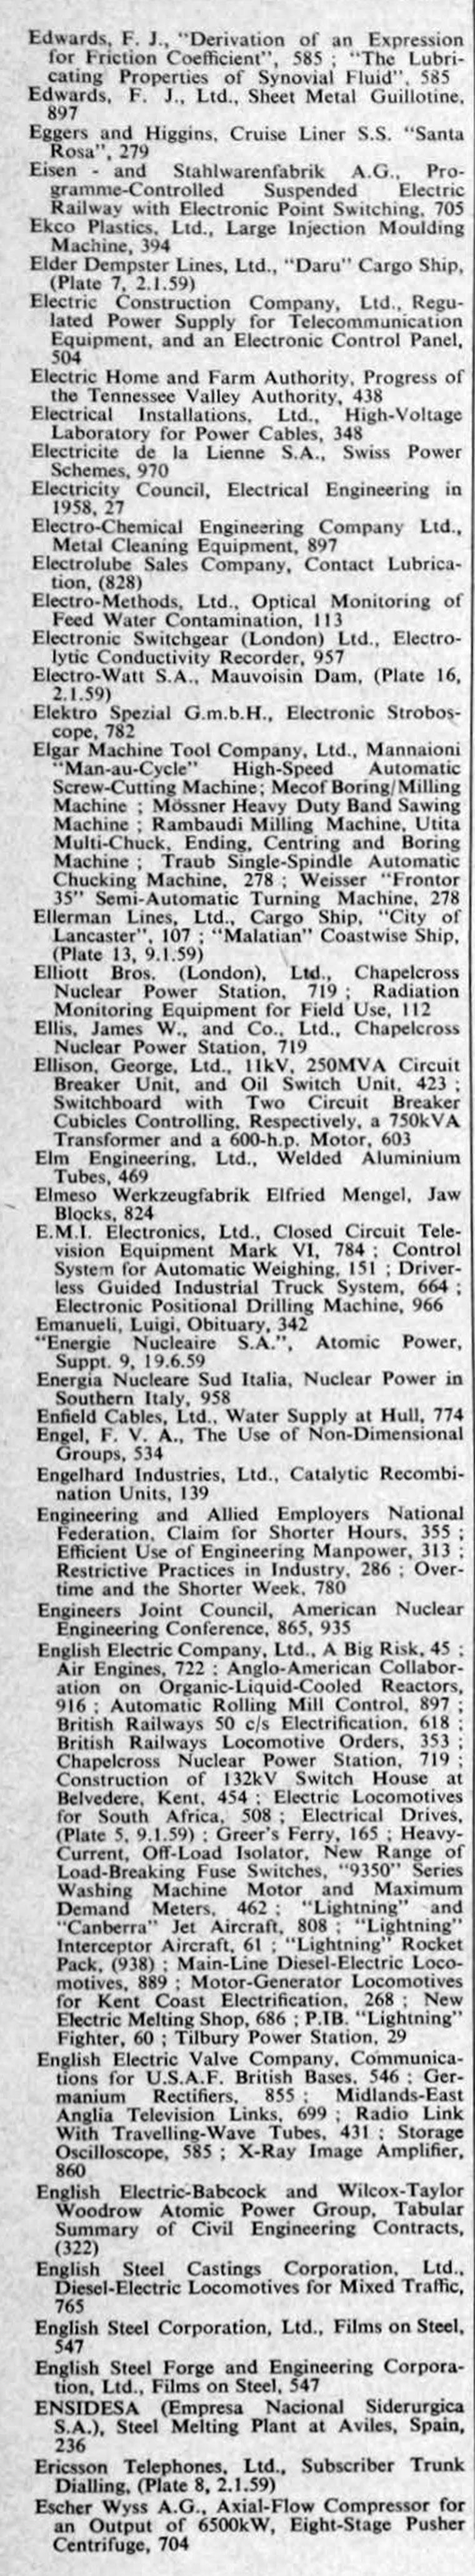 The Engineer 1959 Jan-Jun: Index